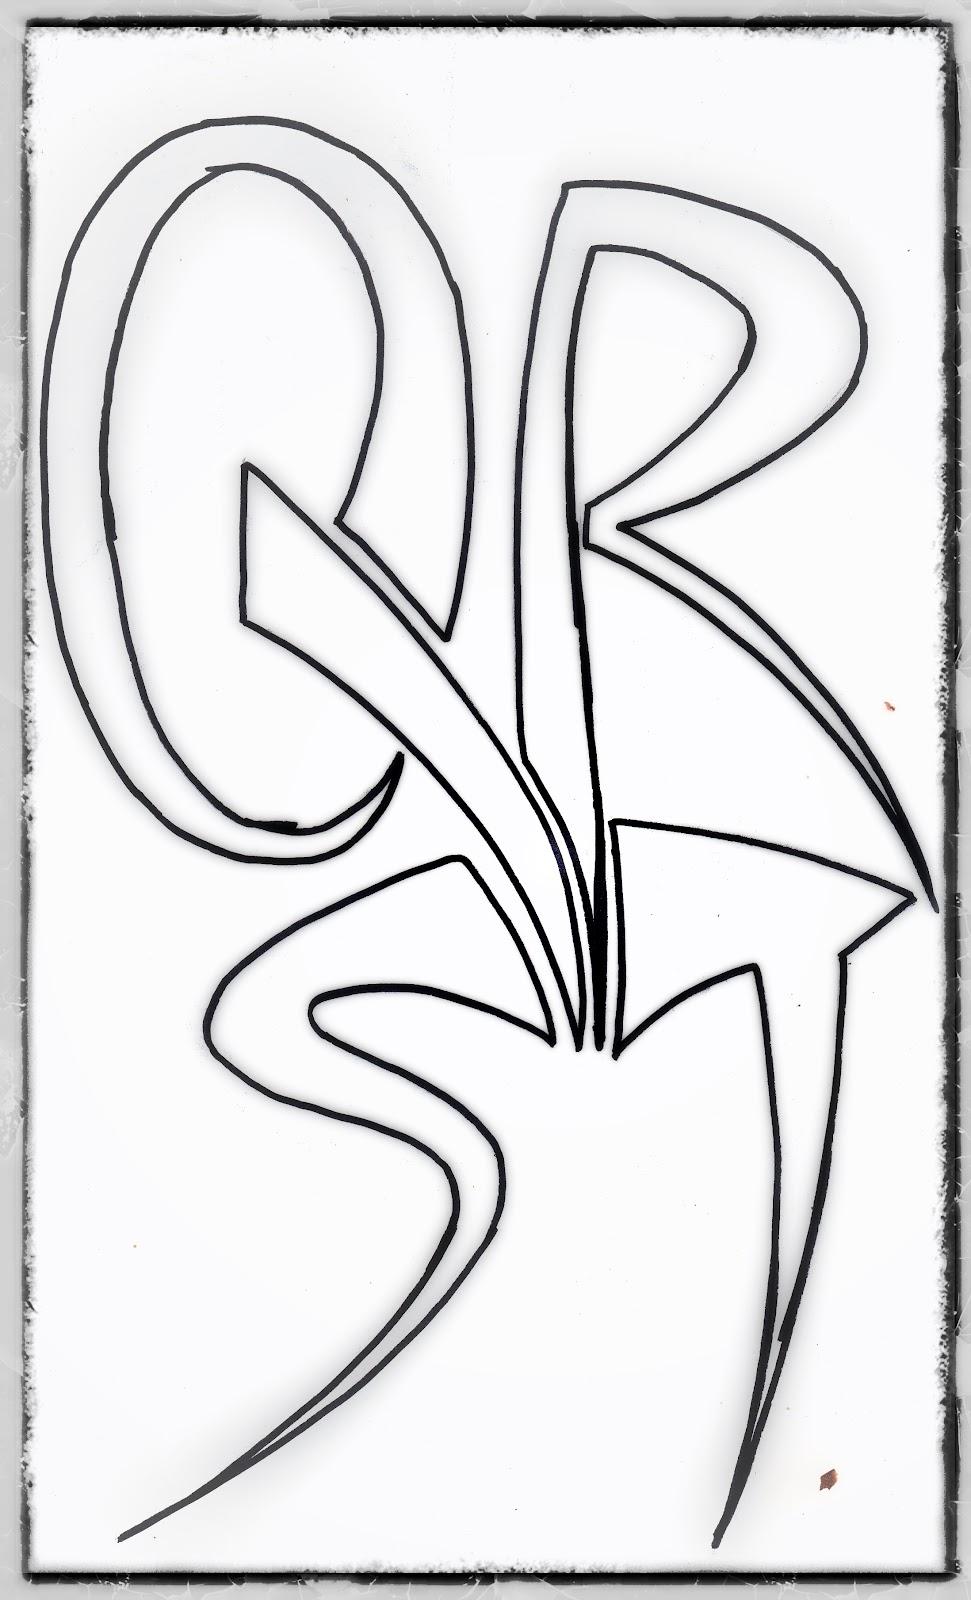 Stylish Letter Q Stylish Letter R Stylish Letter S Stylish Letter T. D ART  Stylish Letters A to Z